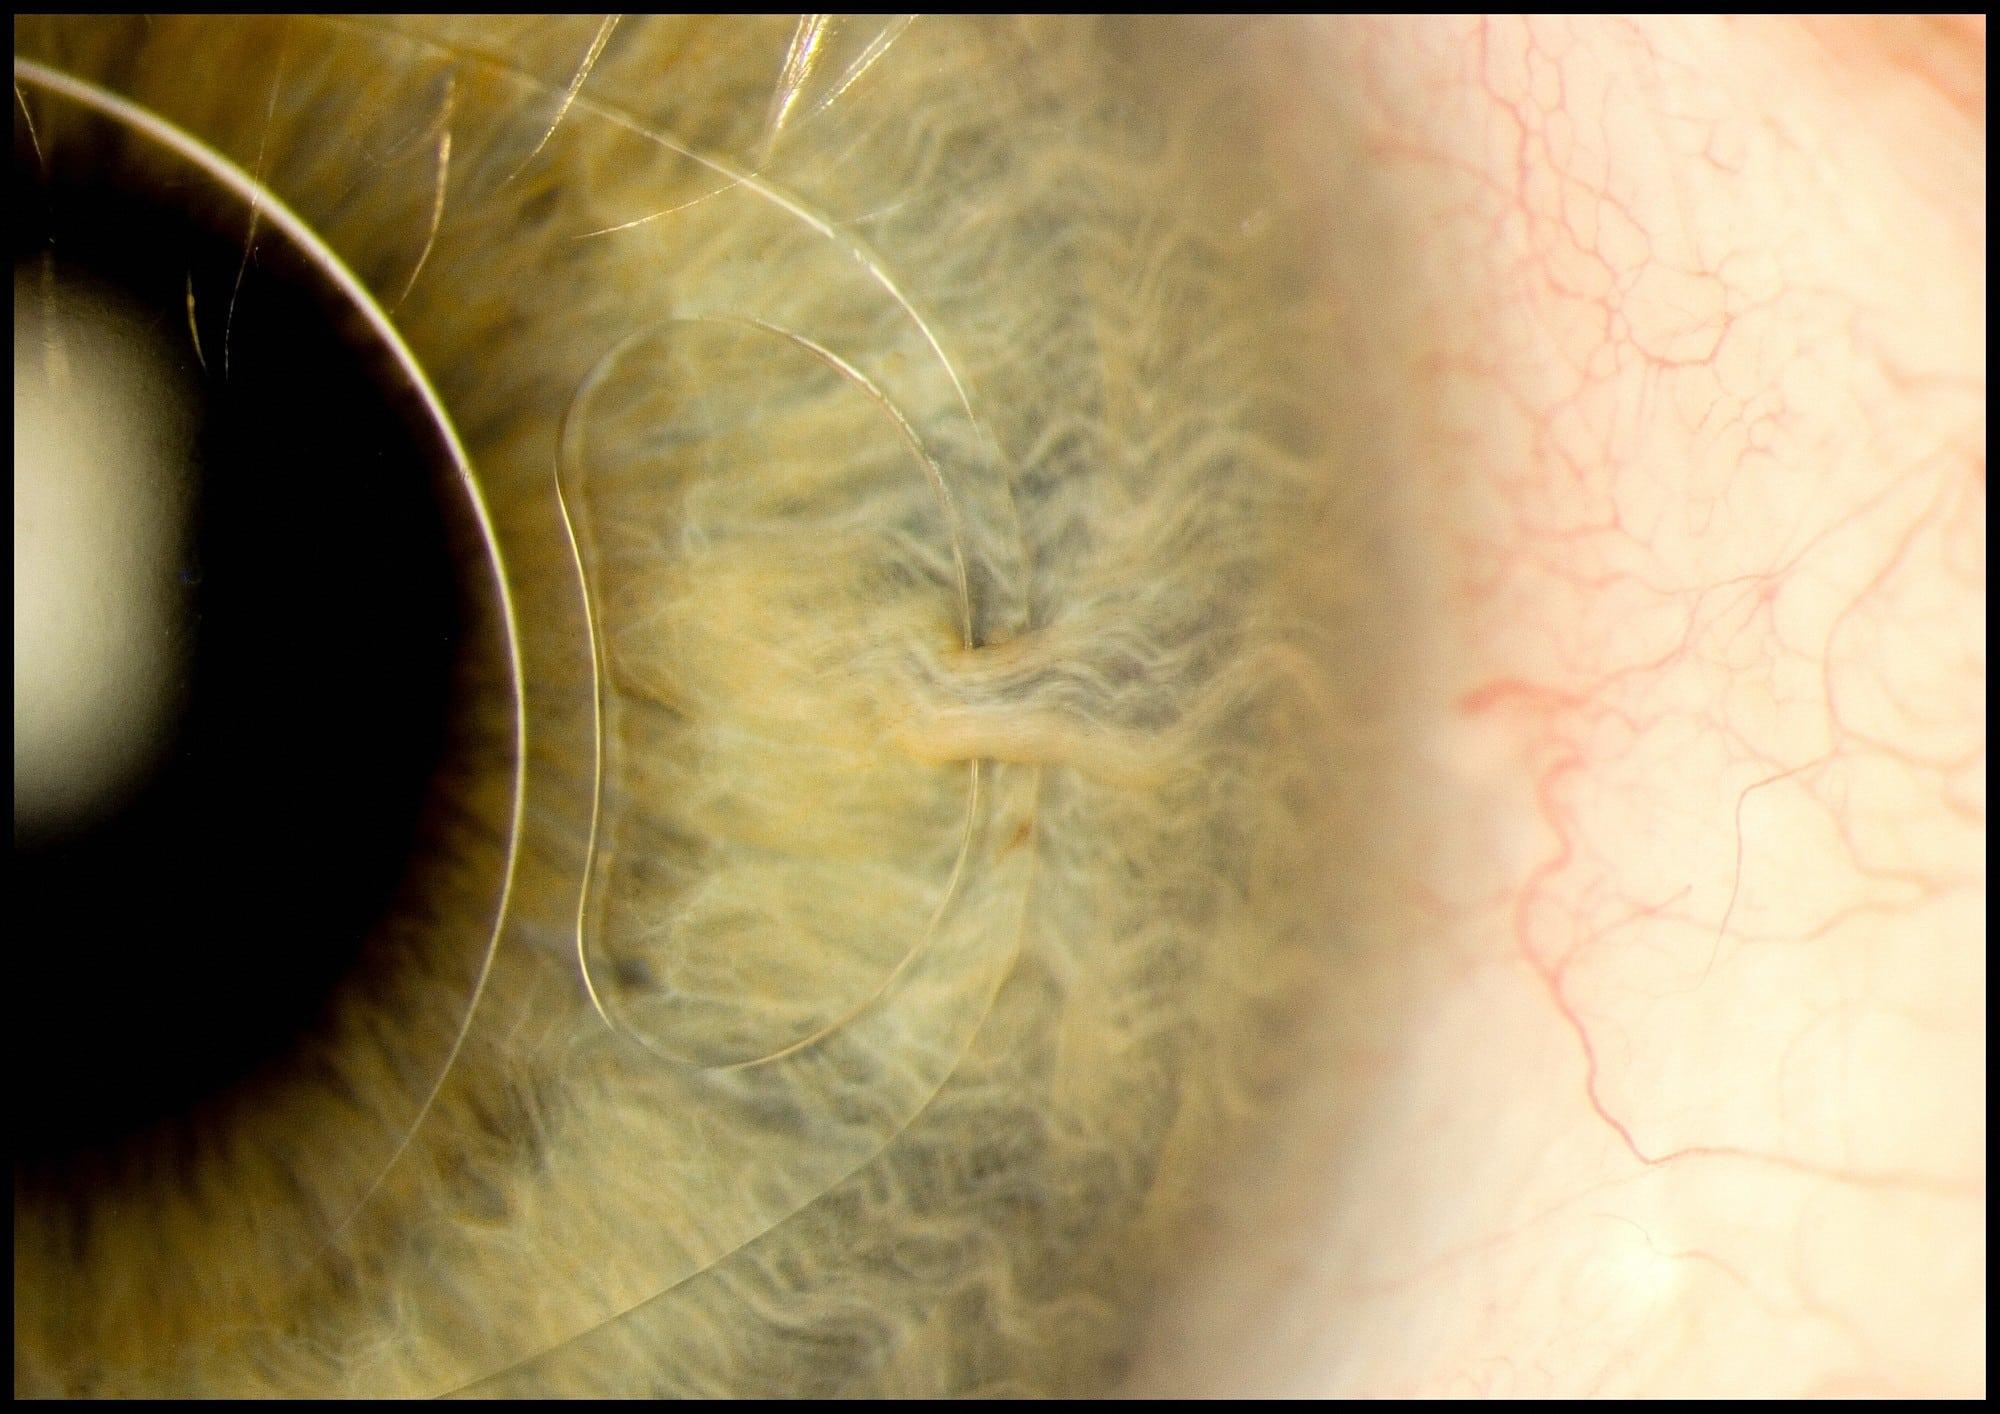 Iris clip lens in the eye